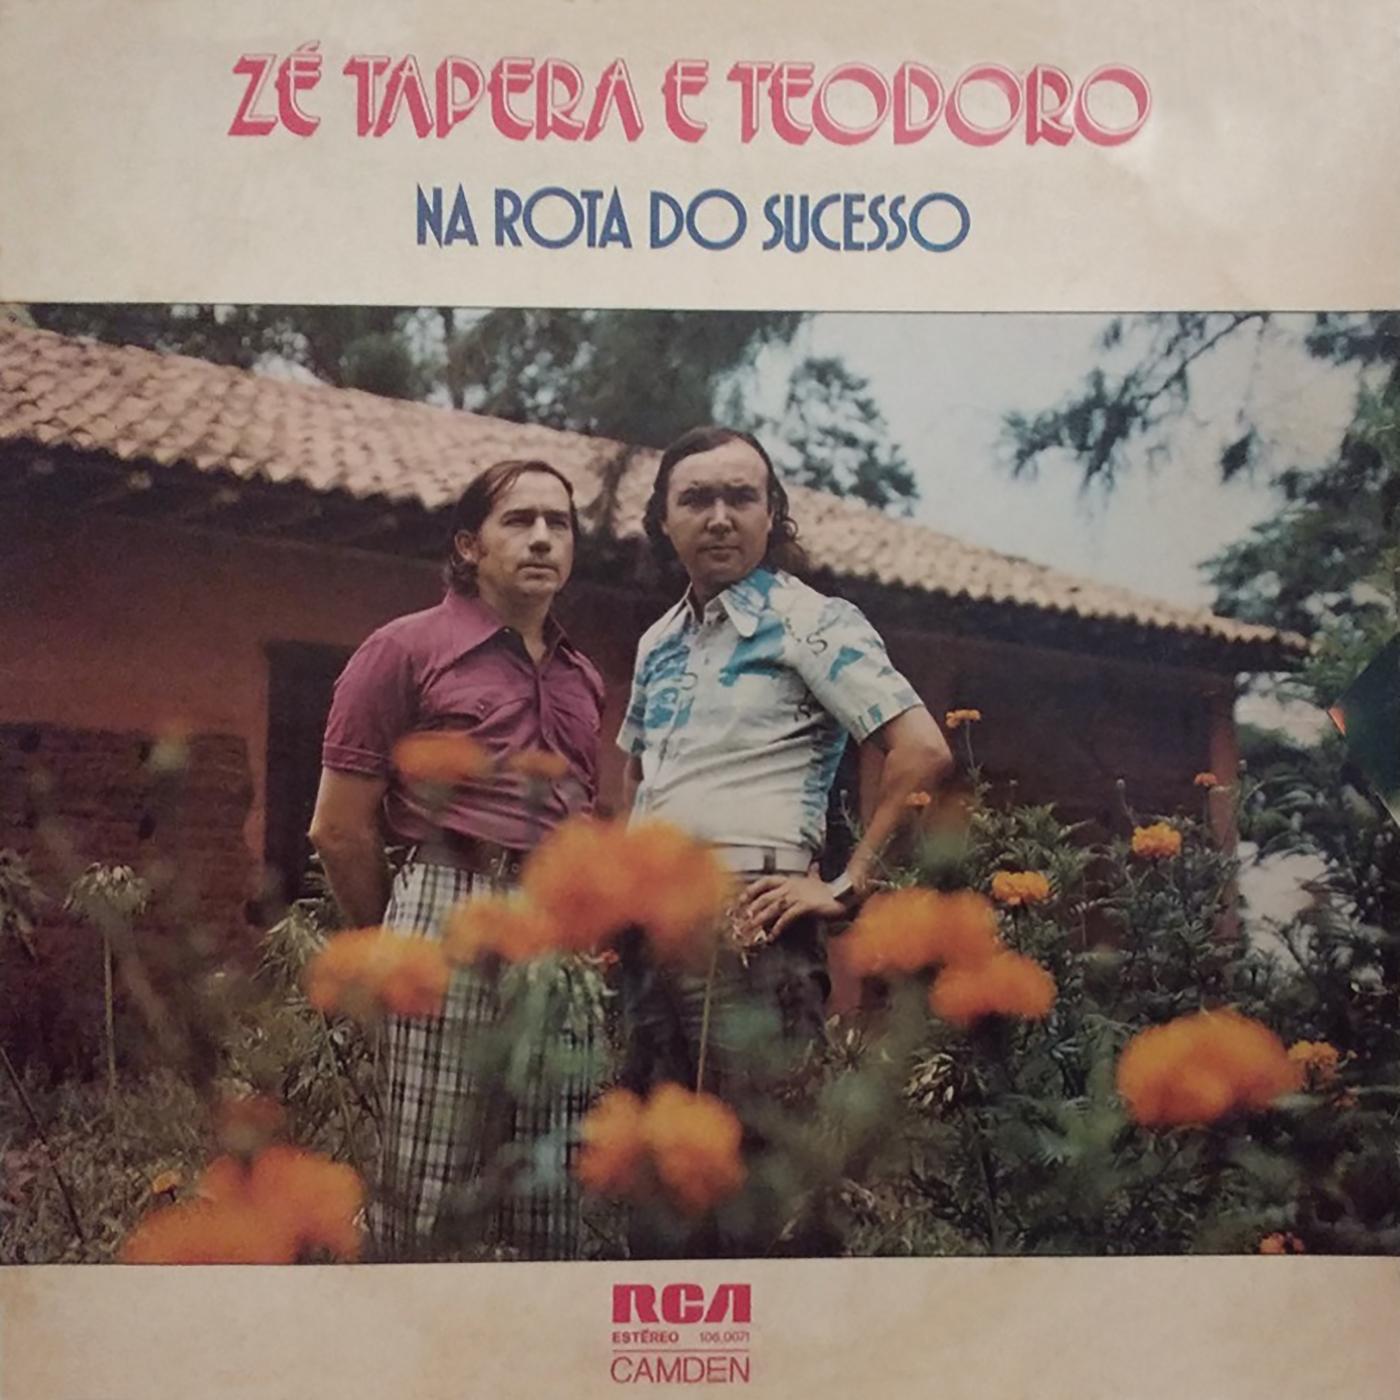 Na Rota do Sucesso - Zé Tapera & Teodoro